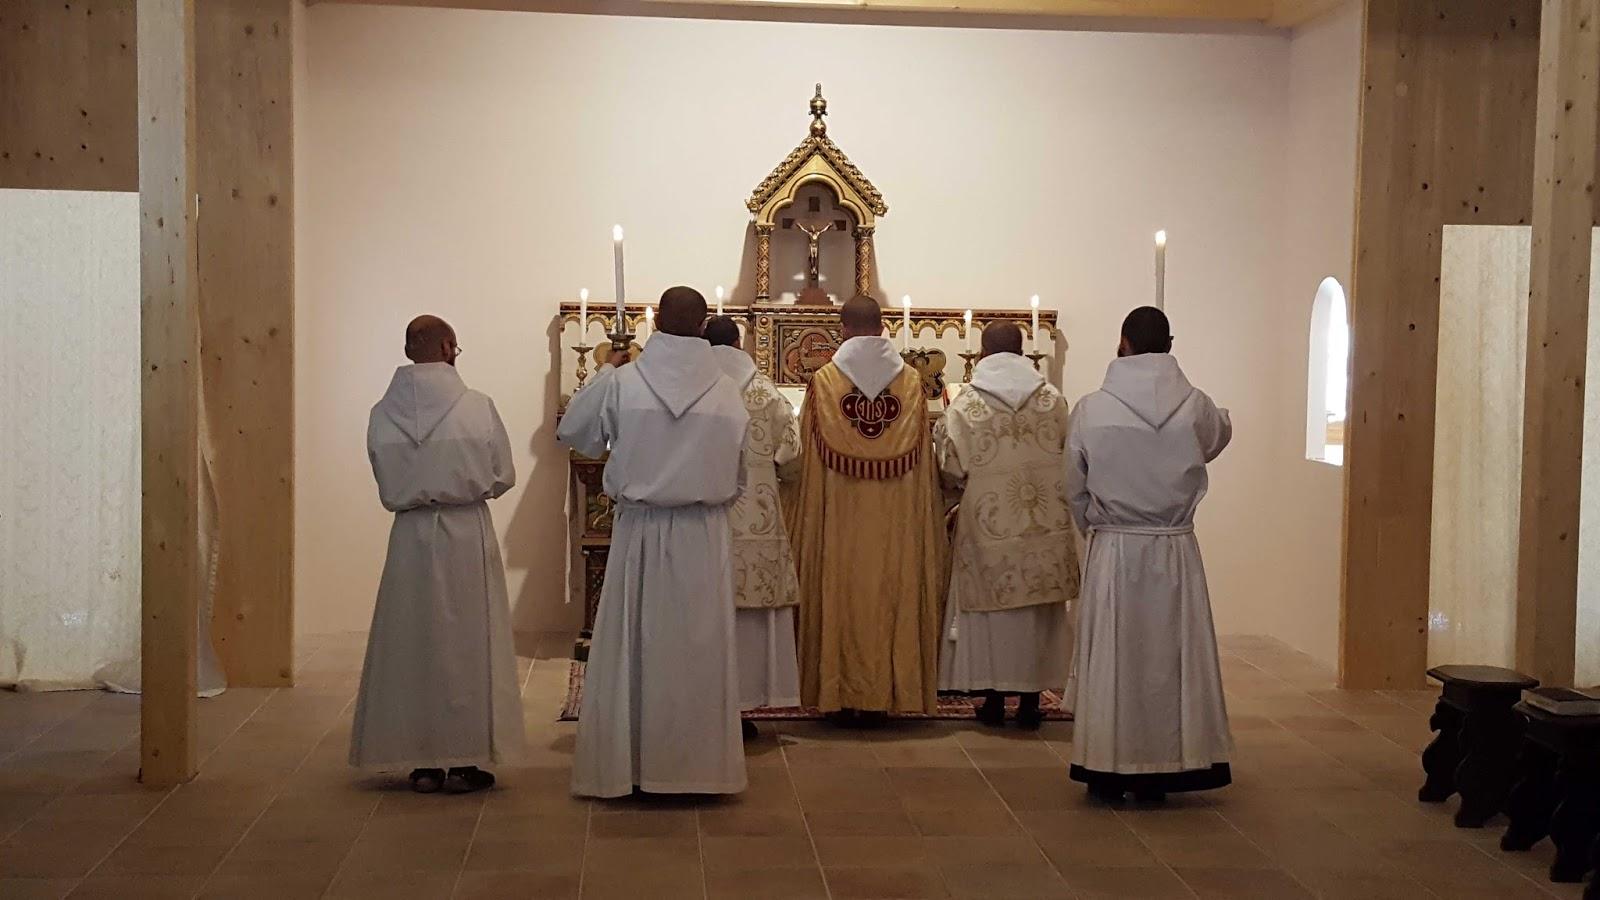 New Liturgical Movement: Solemn High Mass of Thanksgiving at